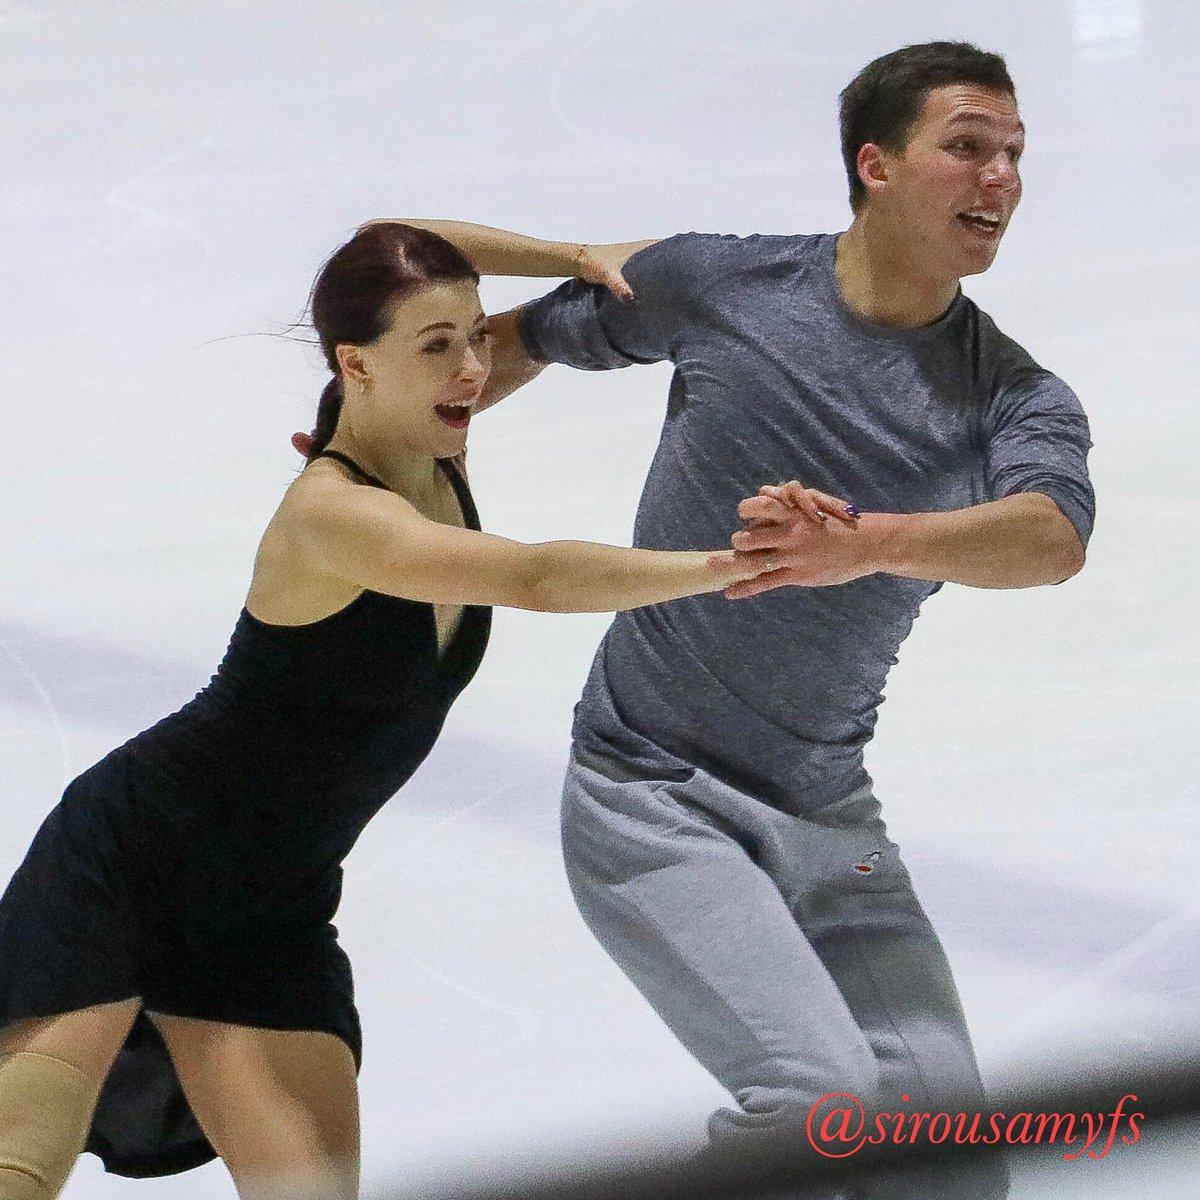 Екатерина Боброва - Дмитрий Соловьев - 2 - Страница 32 DVKWd8EU8AE58Lb